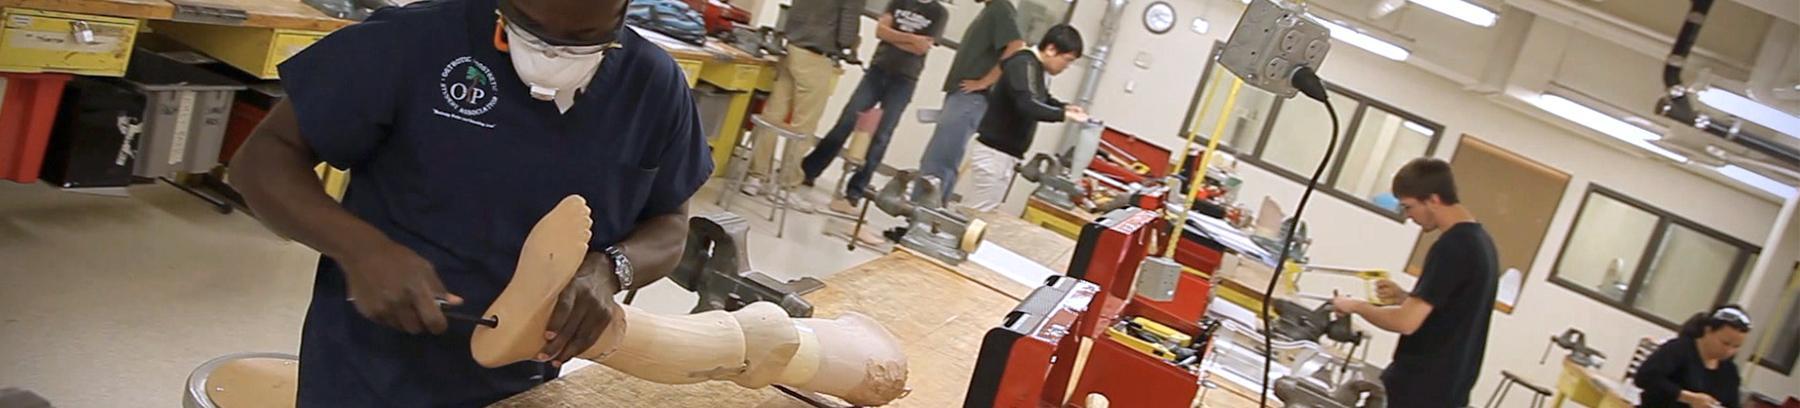 Image of student working on prosthetics.